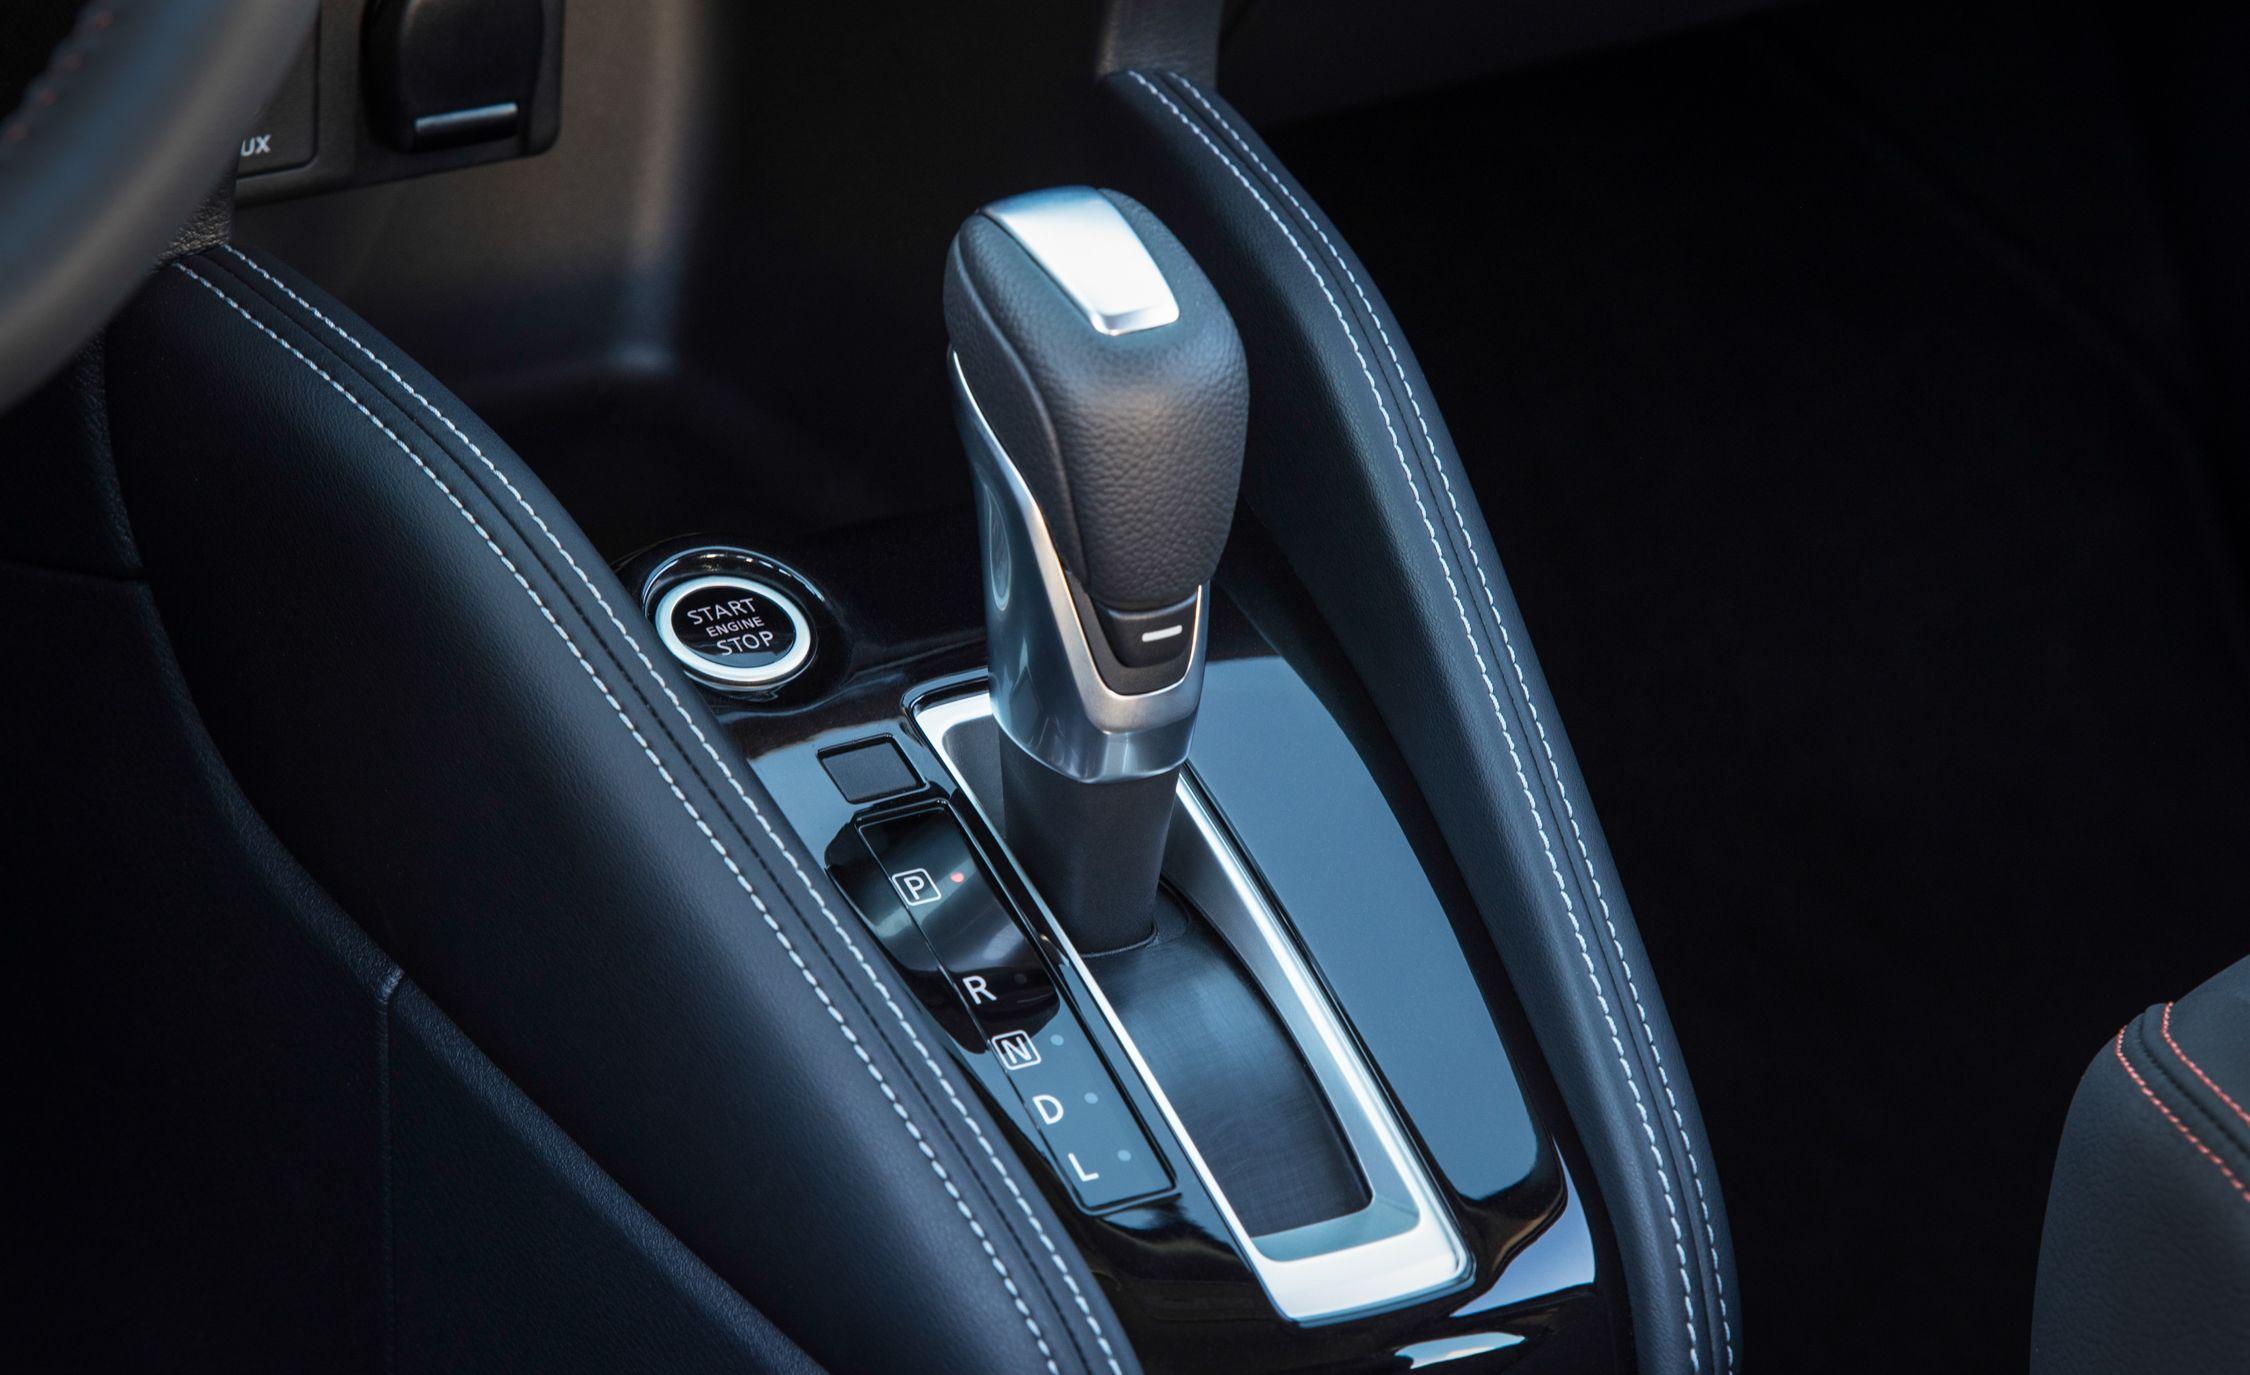 Nissan Kicks Reviews   Nissan Kicks Price, Photos, and Specs   Car and  Driver